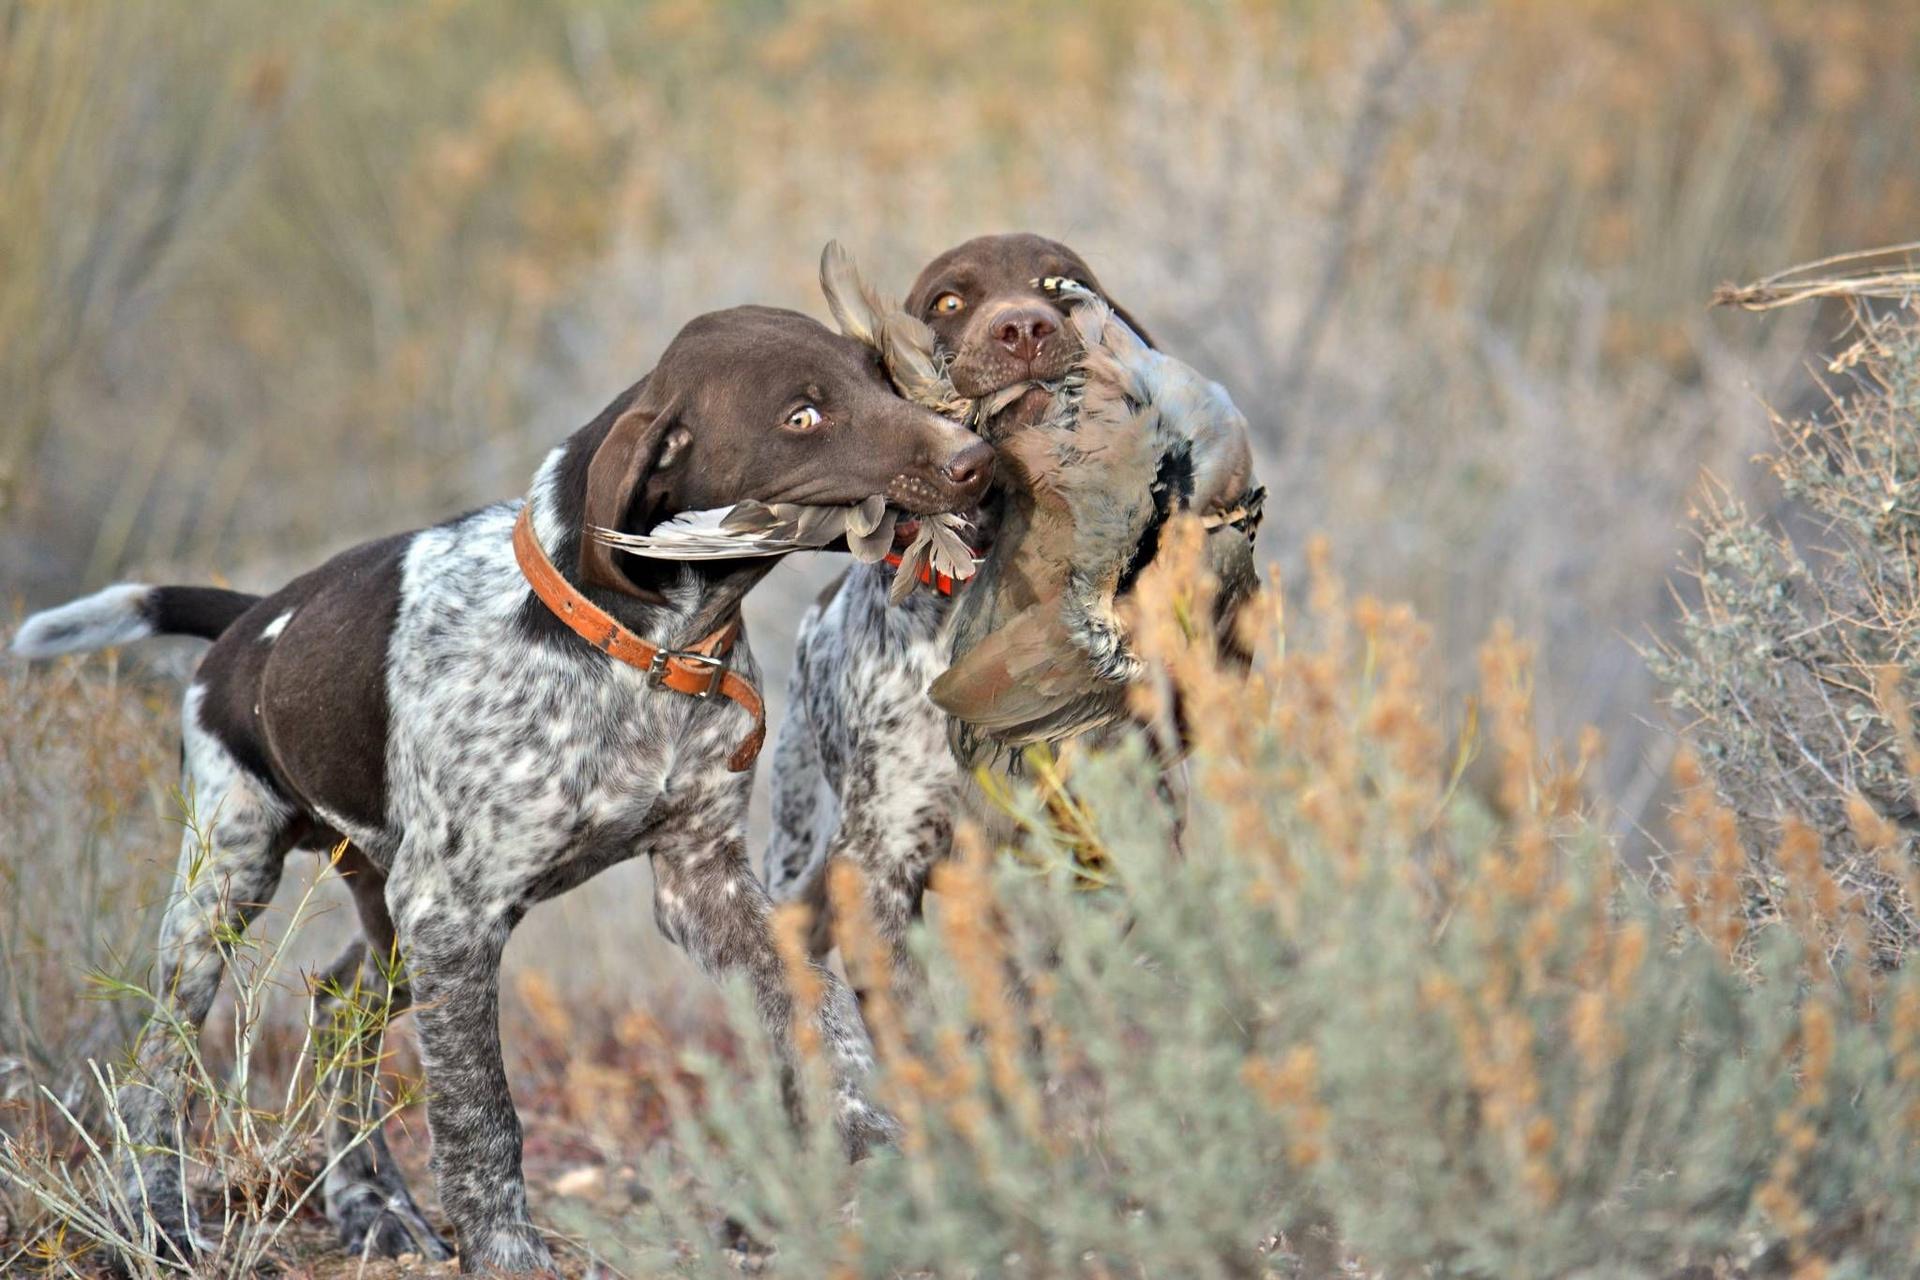 clint_wirick_12-15-2015_hunting_dogs_with_chukars.jpeg